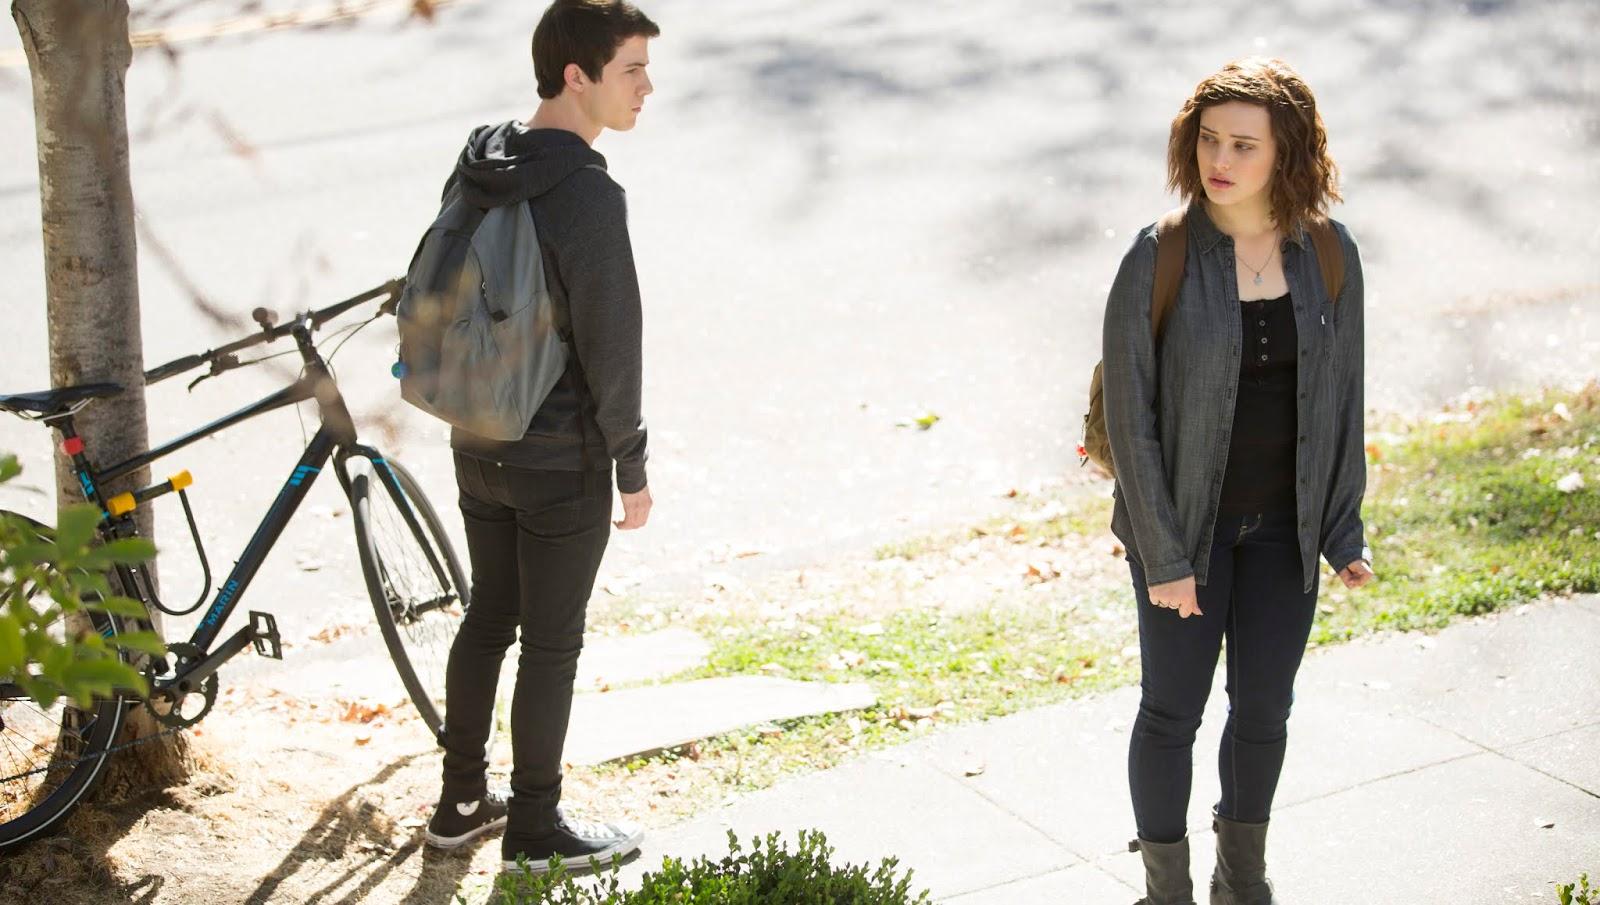 13 Reasons Why, Season 2, Dylan Minnette, Katherine Langford, Clay Jensen, TV Series